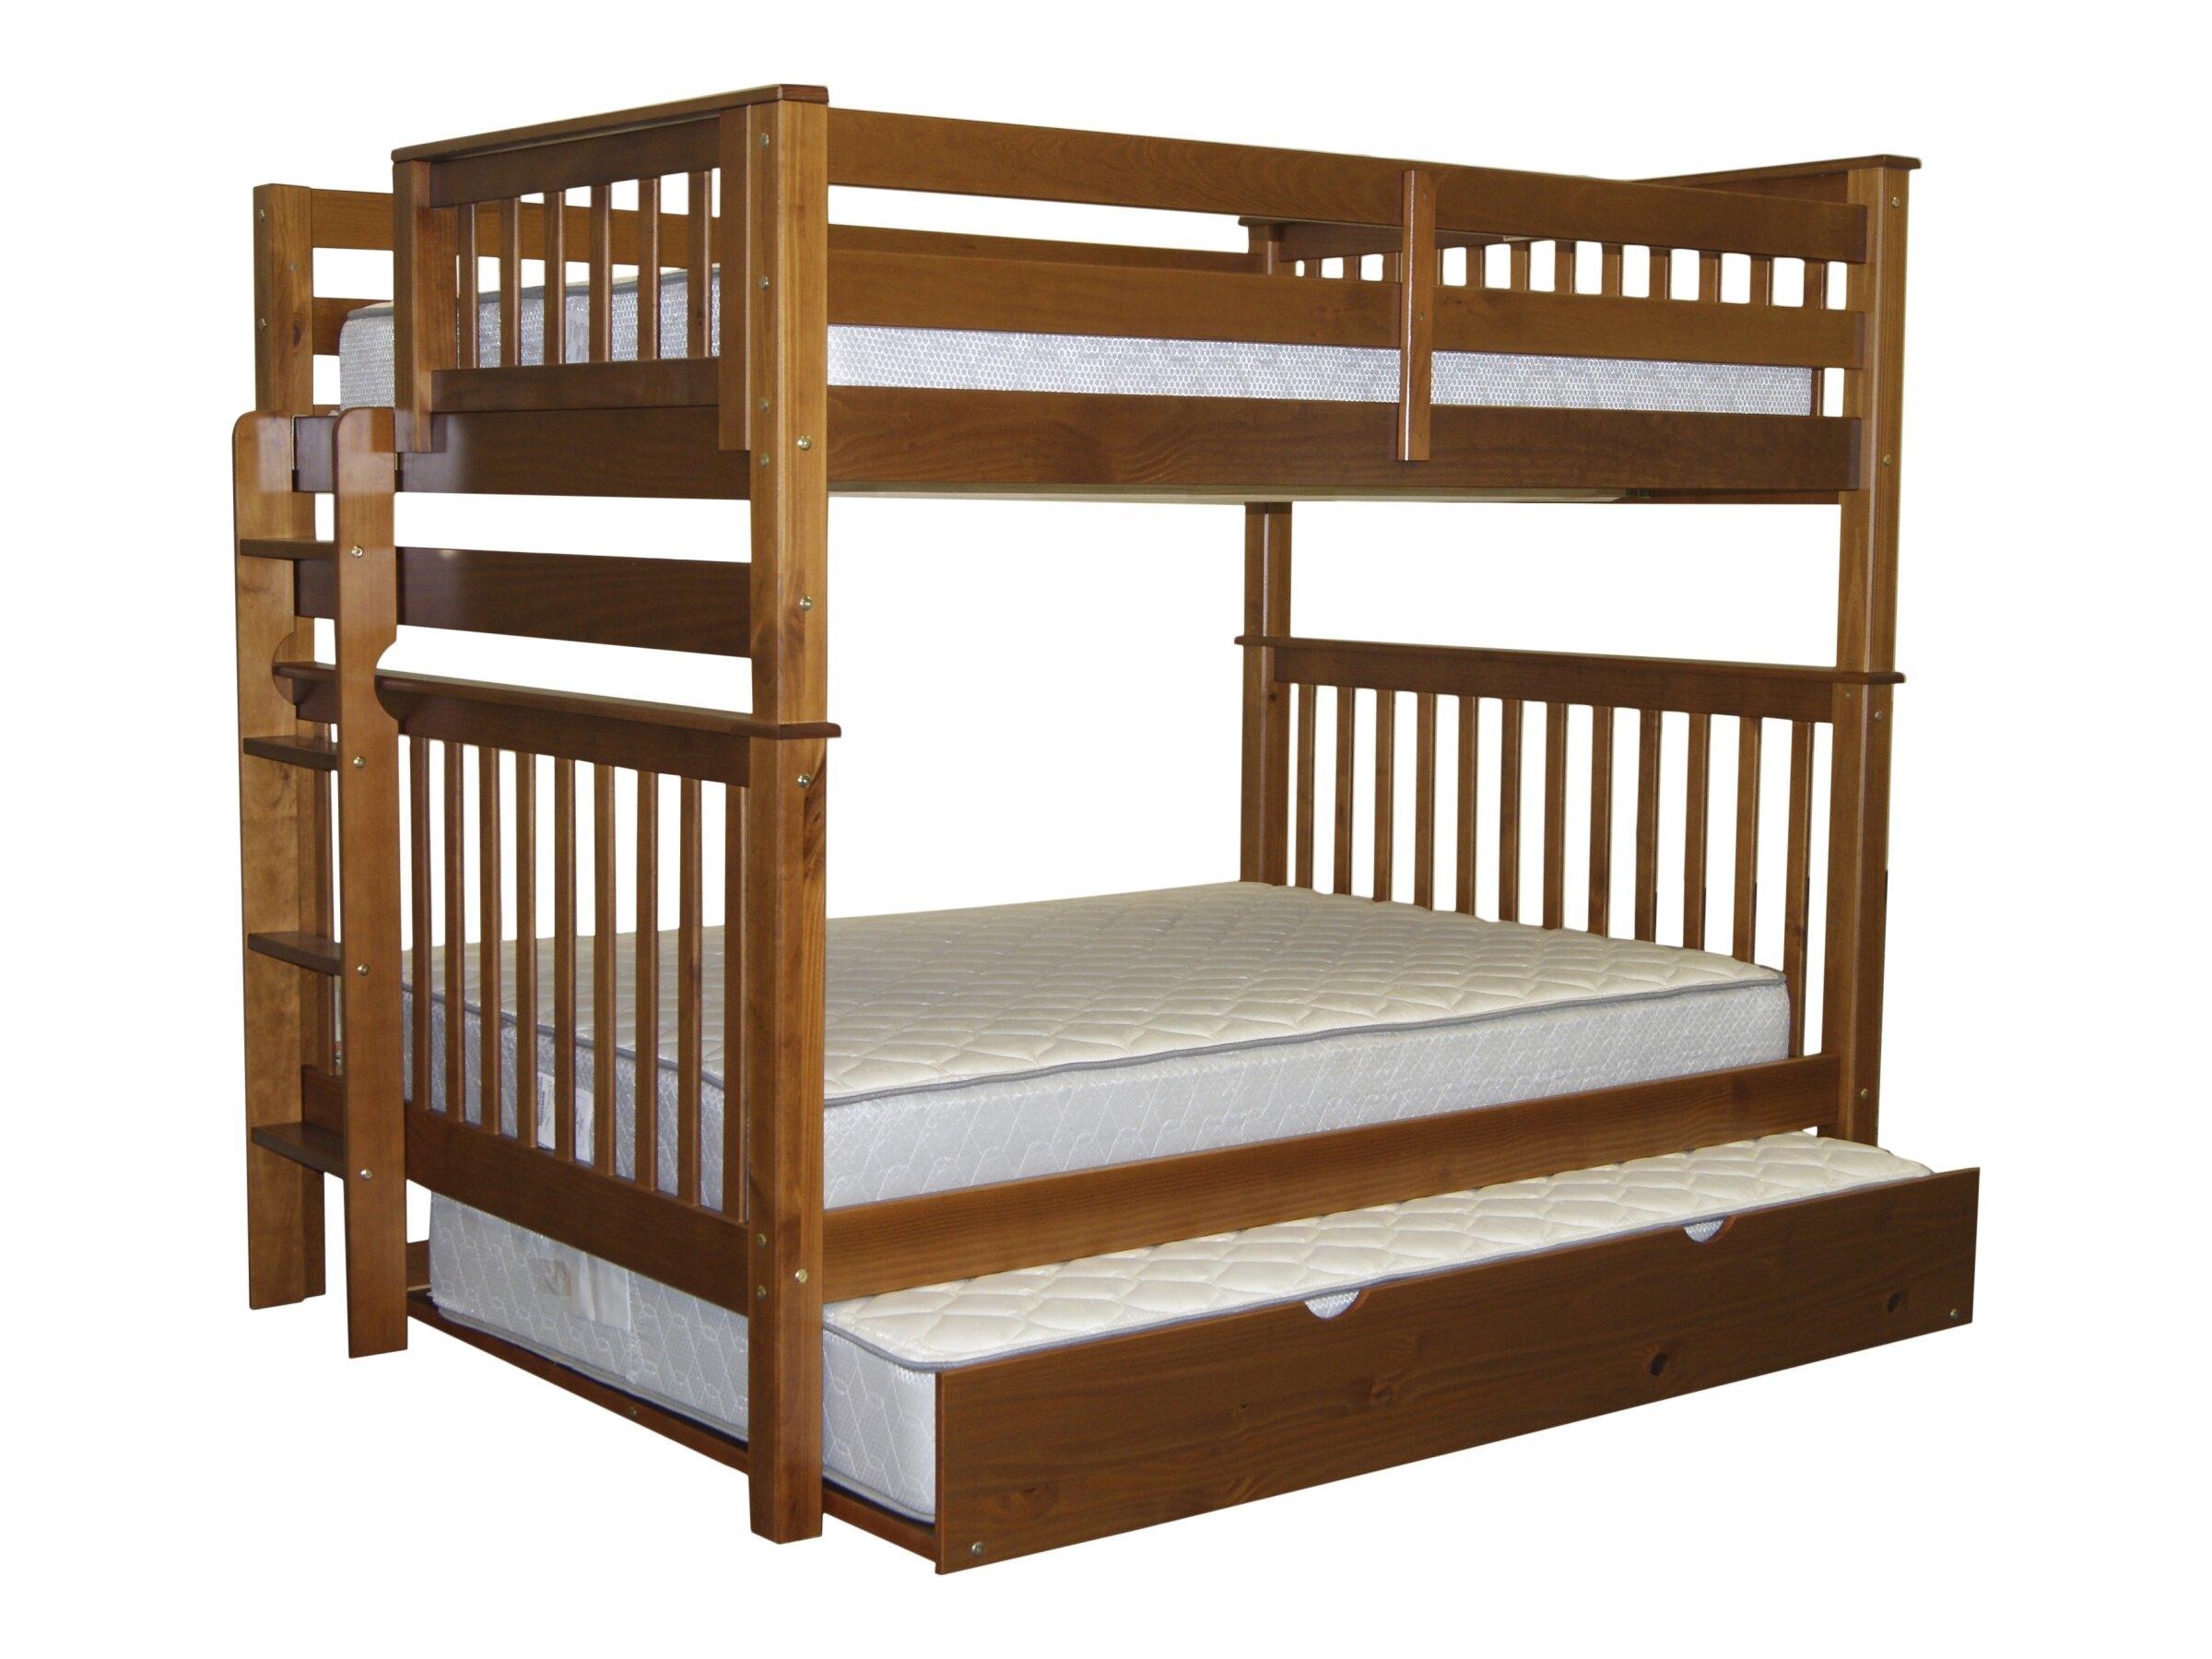 lig over wood ladder with p light full in finish htm bed bunk natural